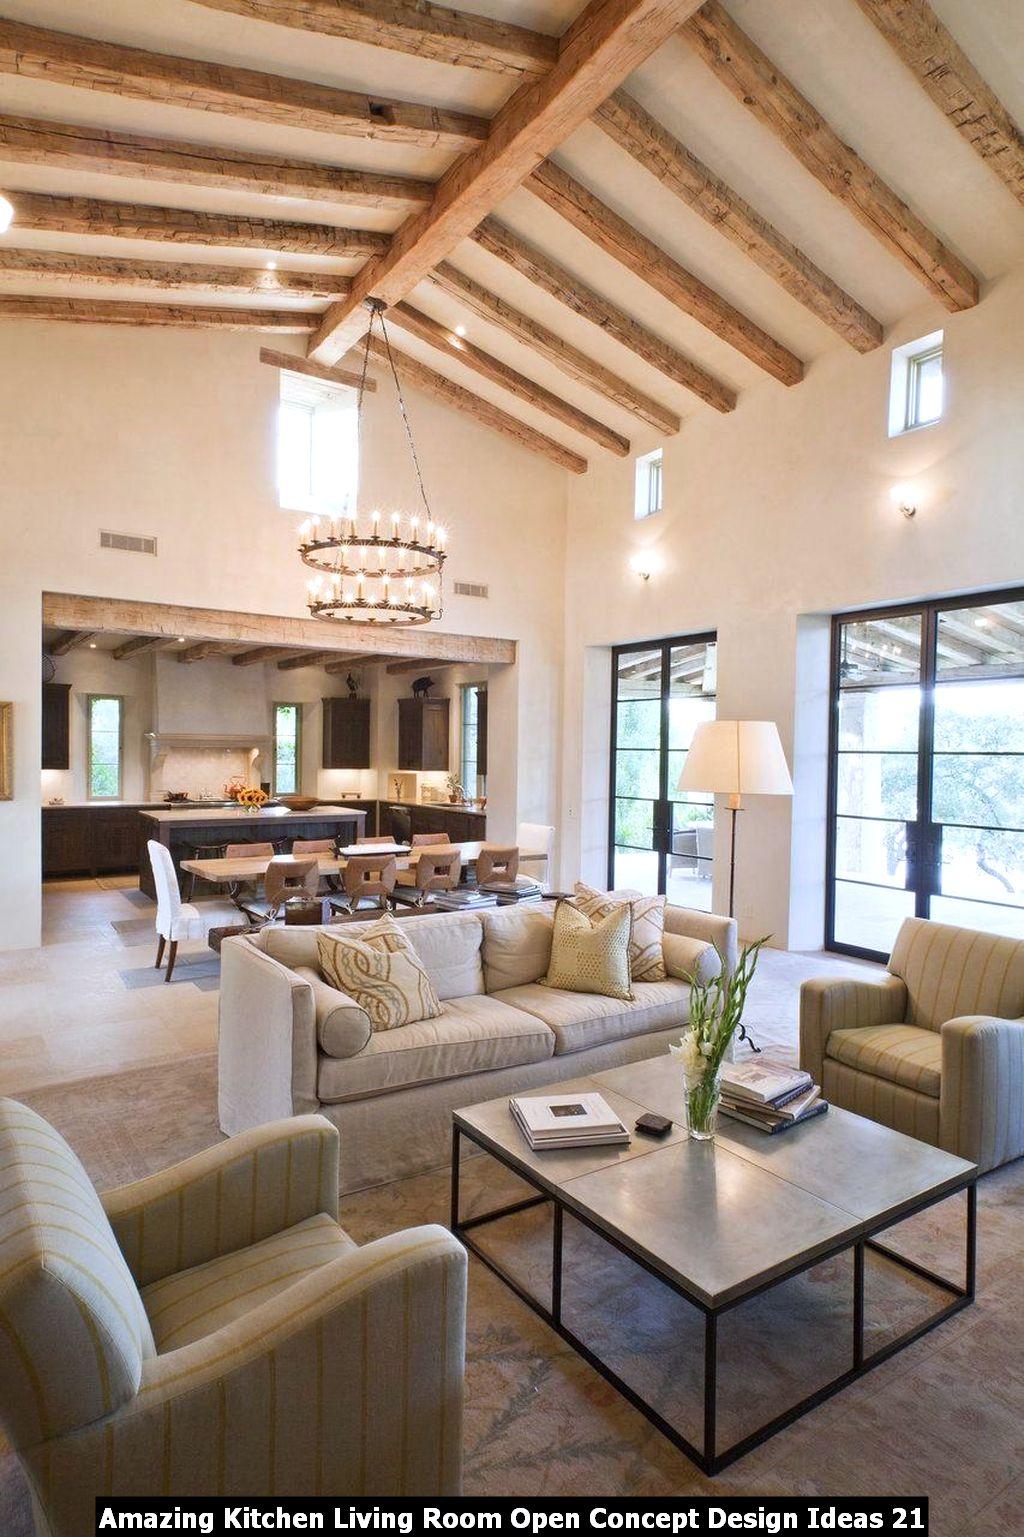 Amazing Kitchen Living Room Open Concept Design Ideas 21